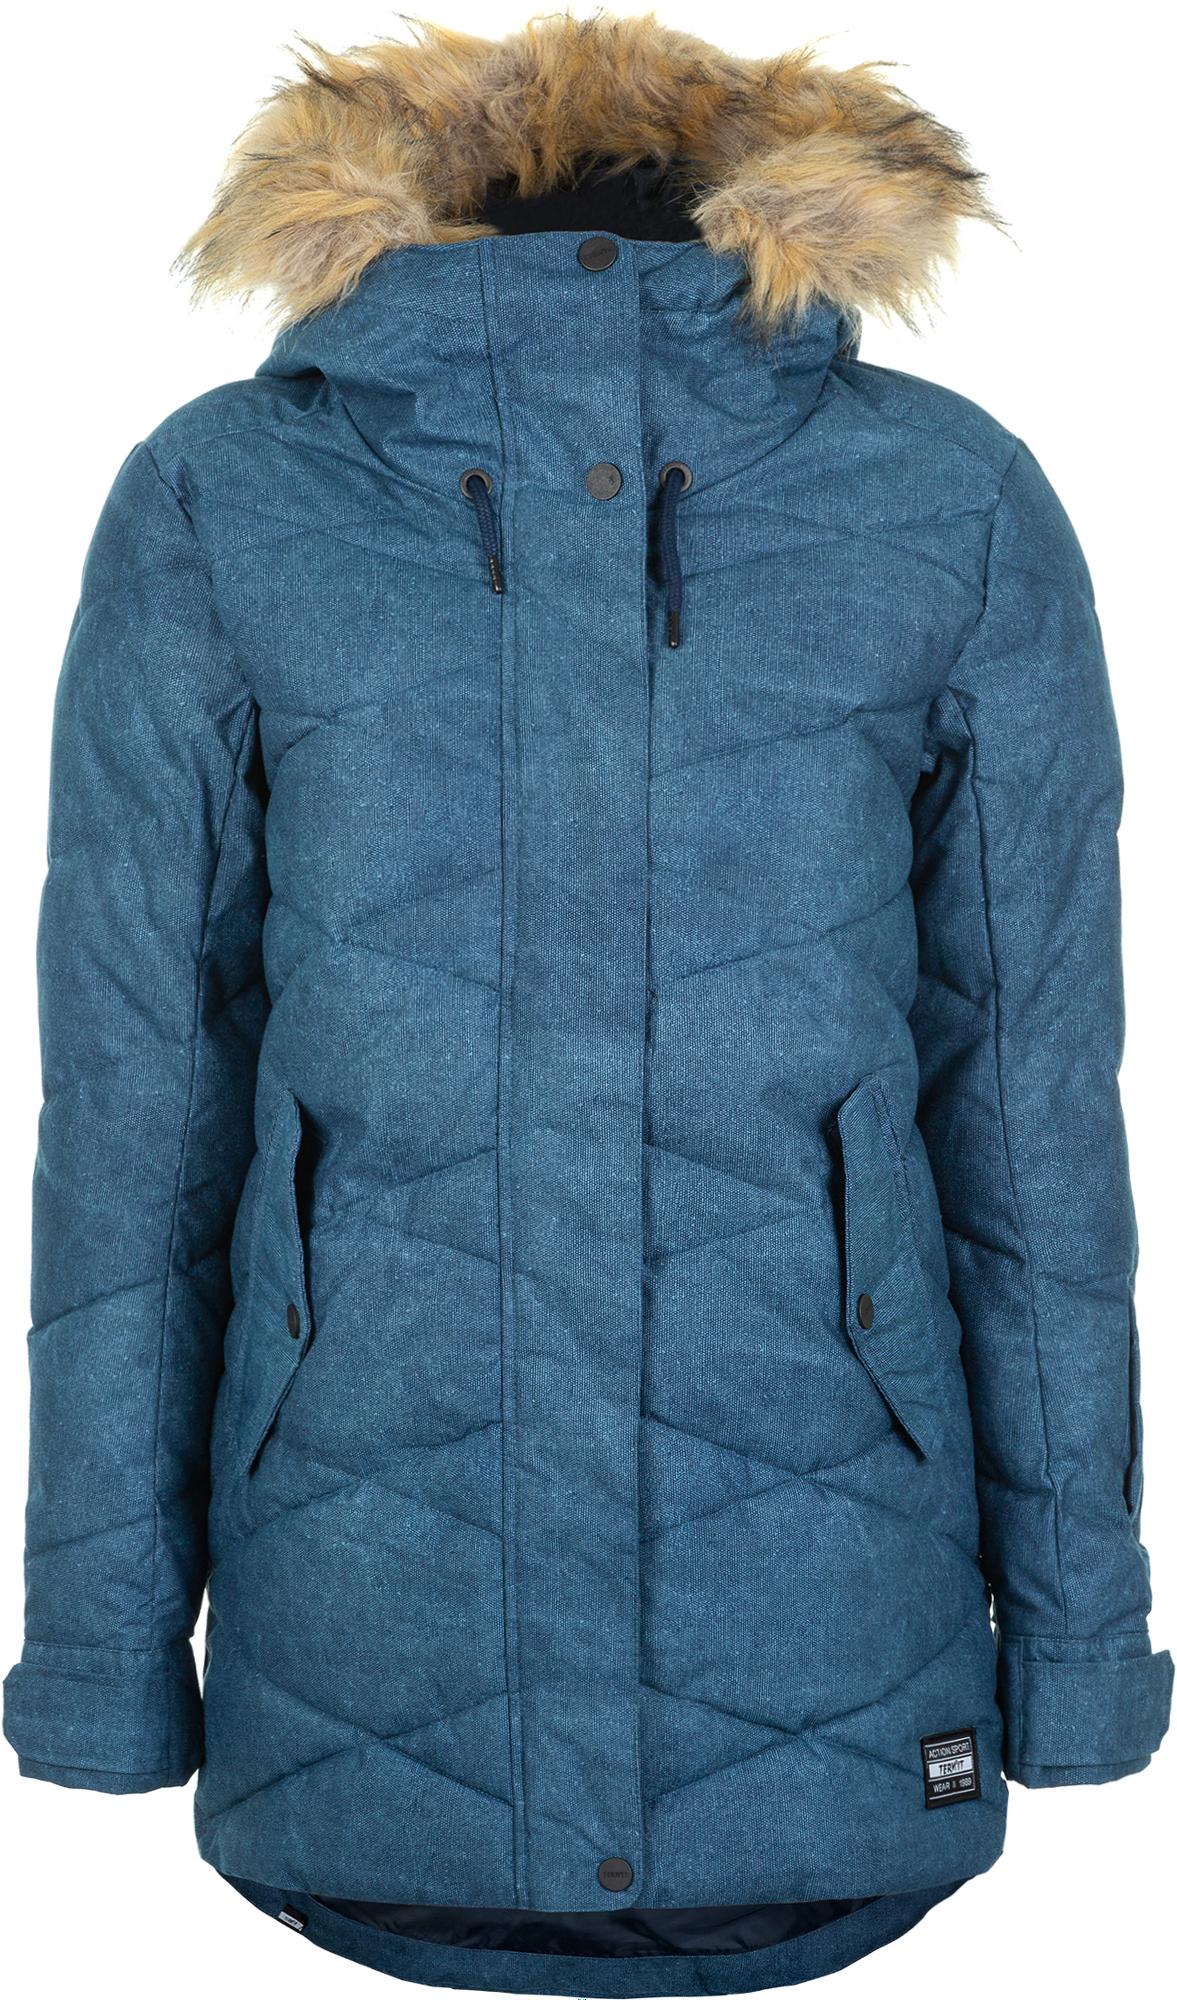 Termit Куртка утепленная женская Termit, размер 50